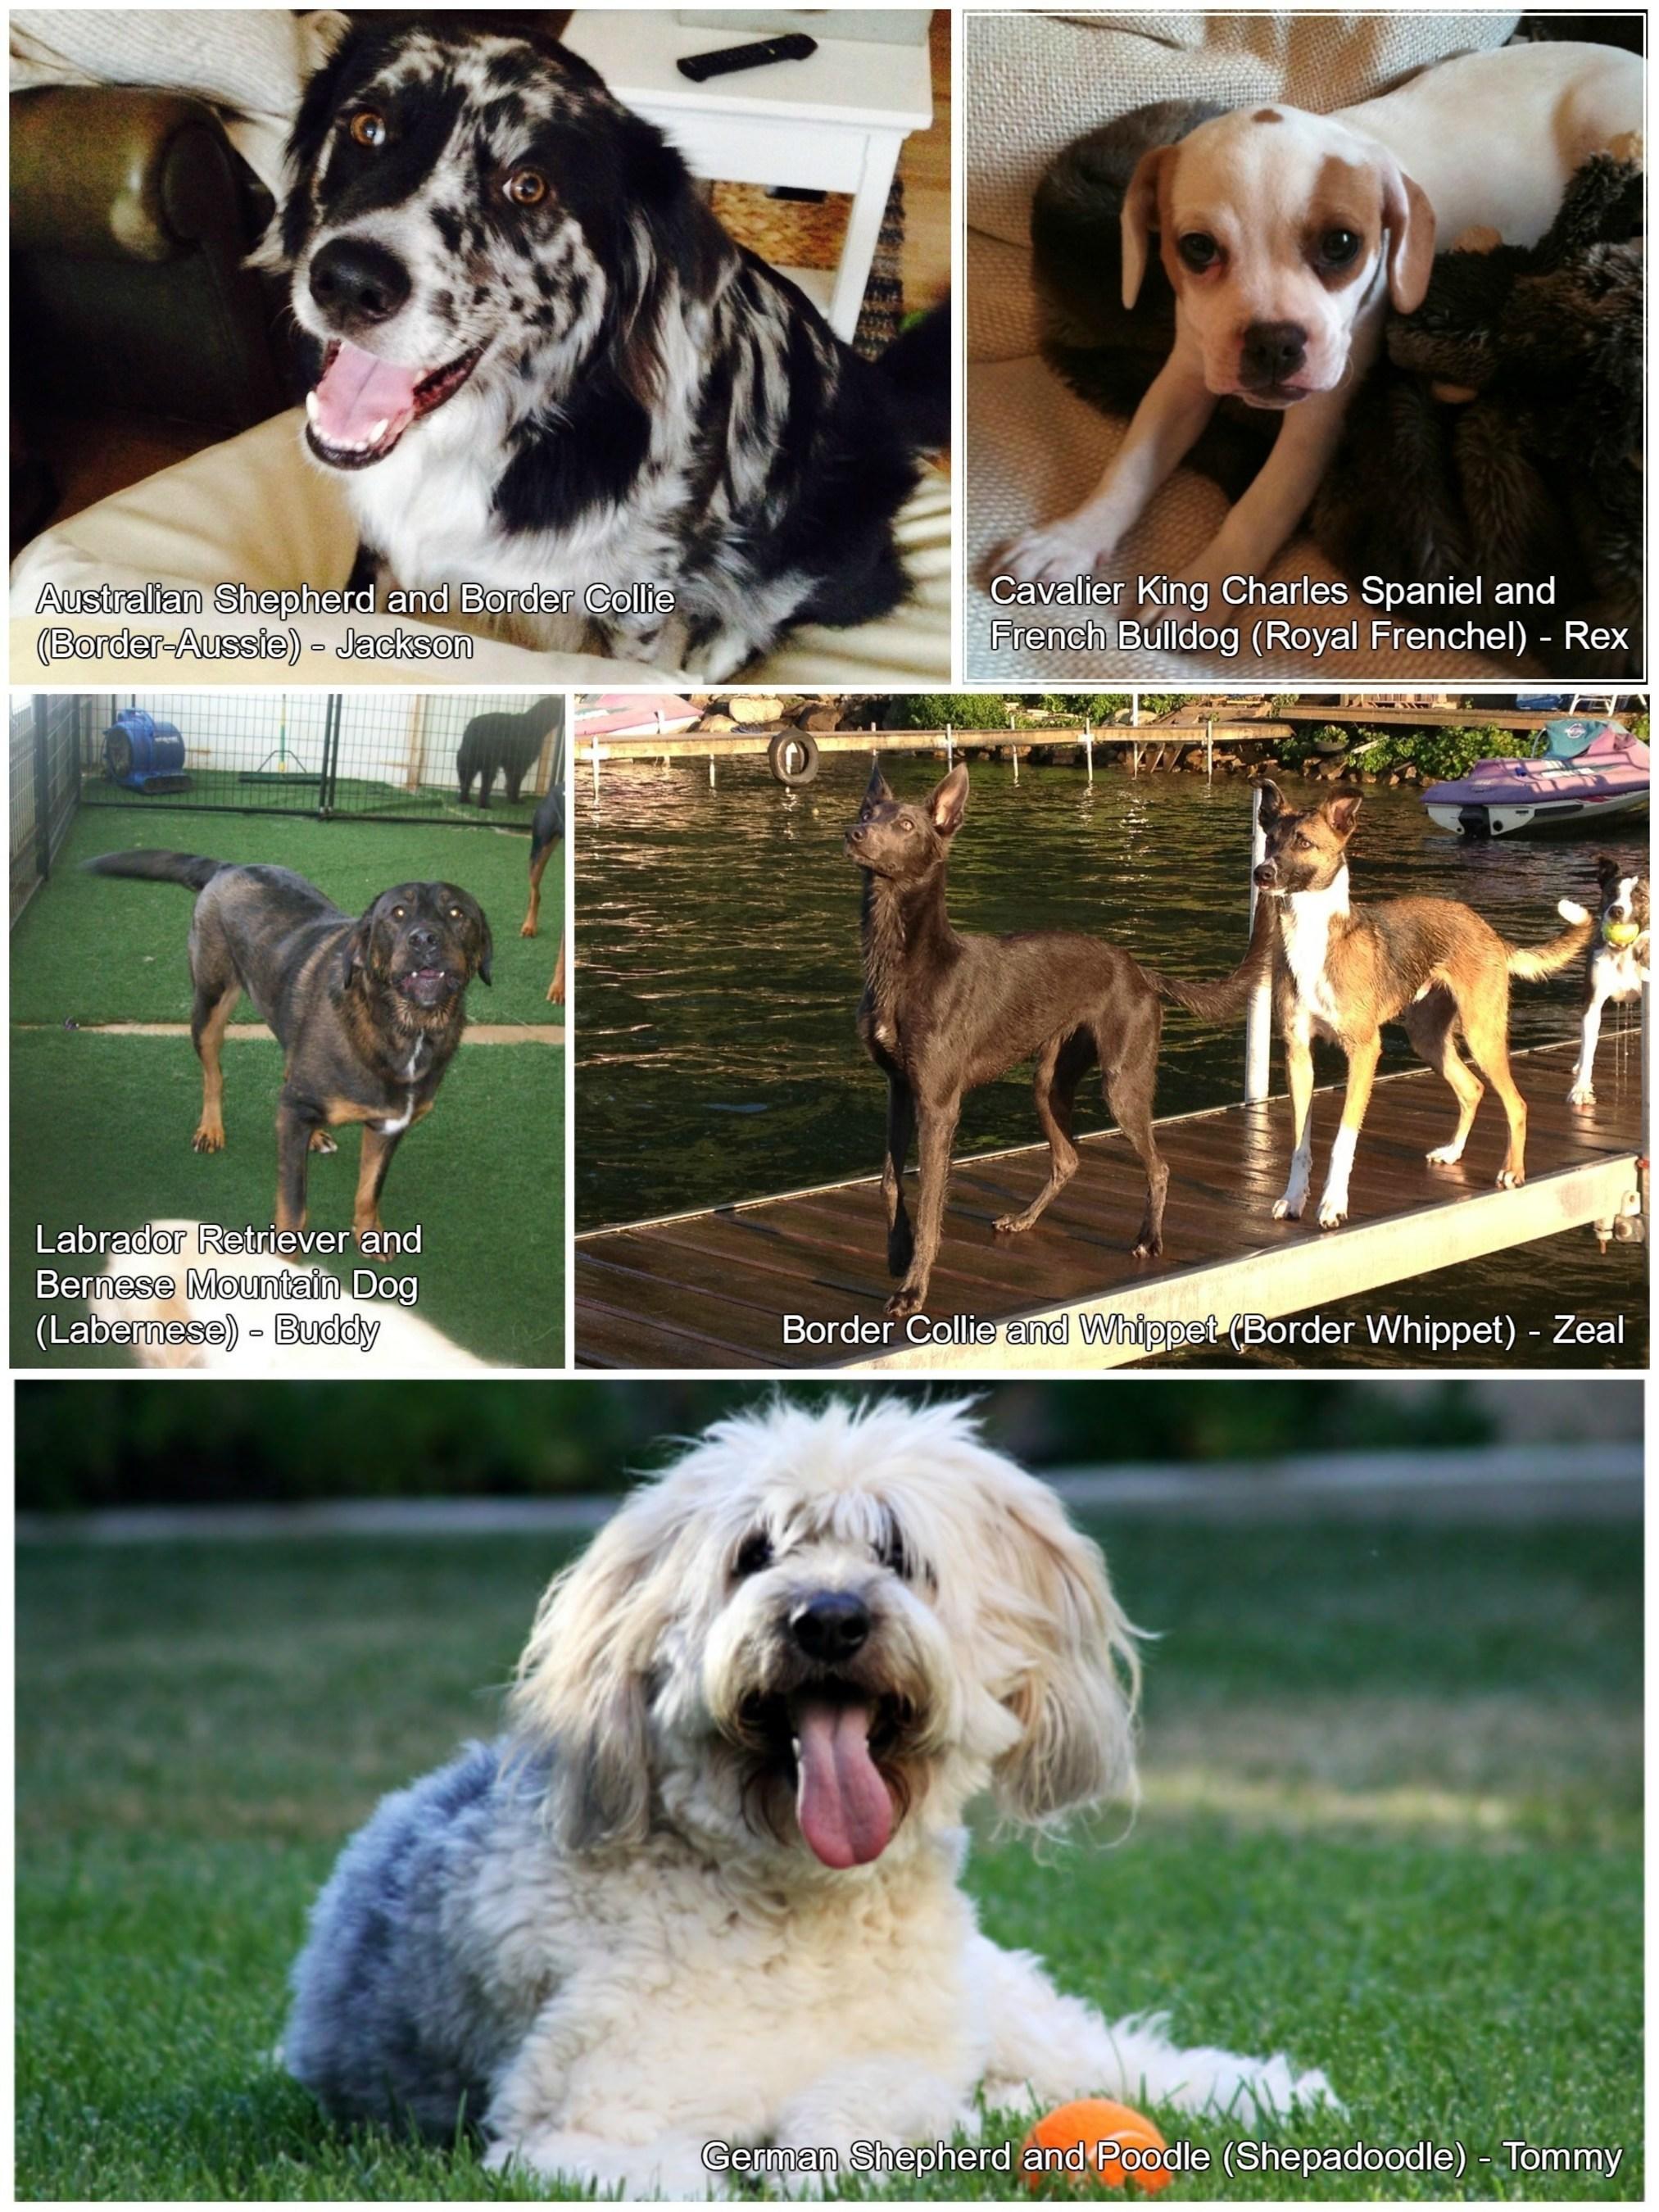 Farmers Insurance & Pets Best Reveal Top 5 Hybrid Dog Breeds